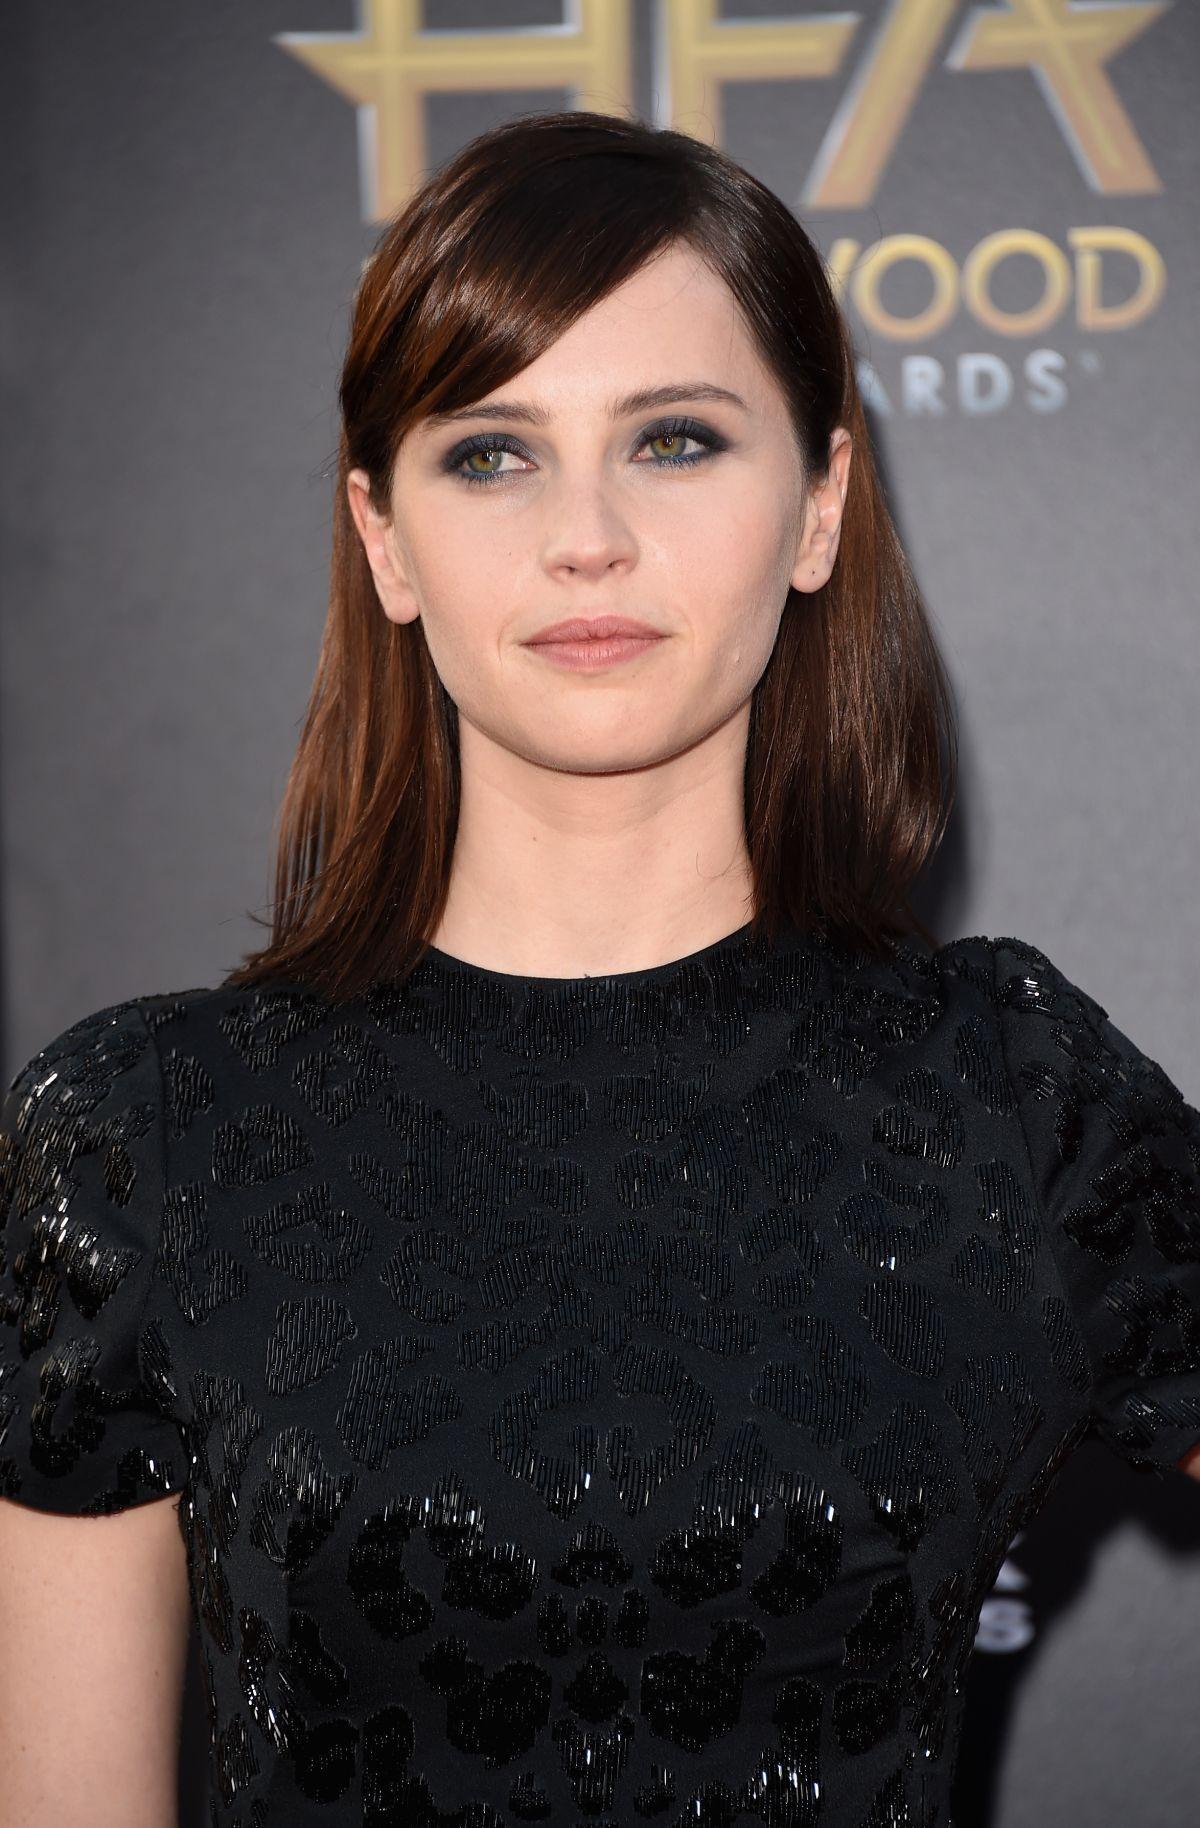 FELICITY JONES at 2014 Hollywood Film Awards